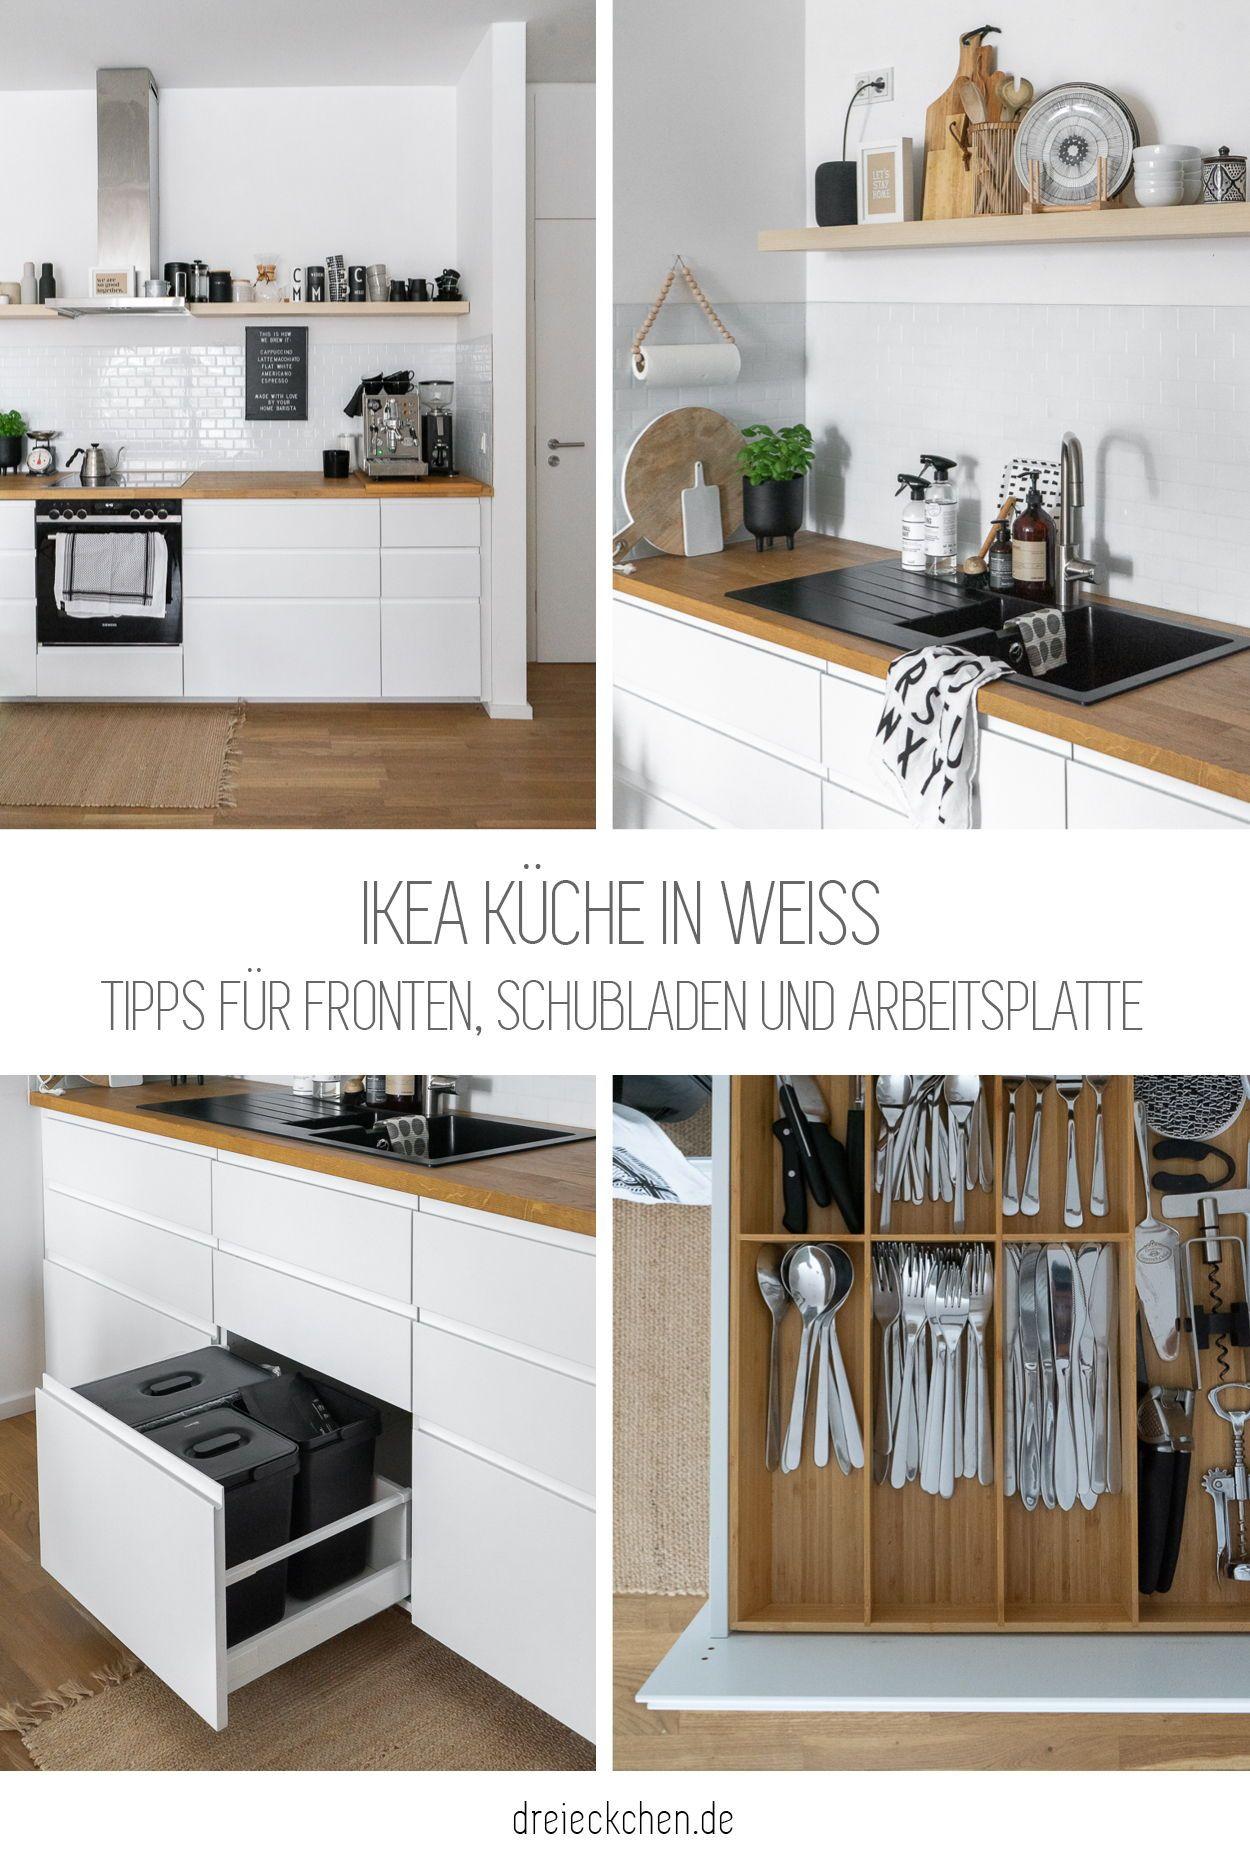 Ikea Kuche In Weiss In 2020 Ikea Kuche Kuche Planen Kleine Kuchen Ideen